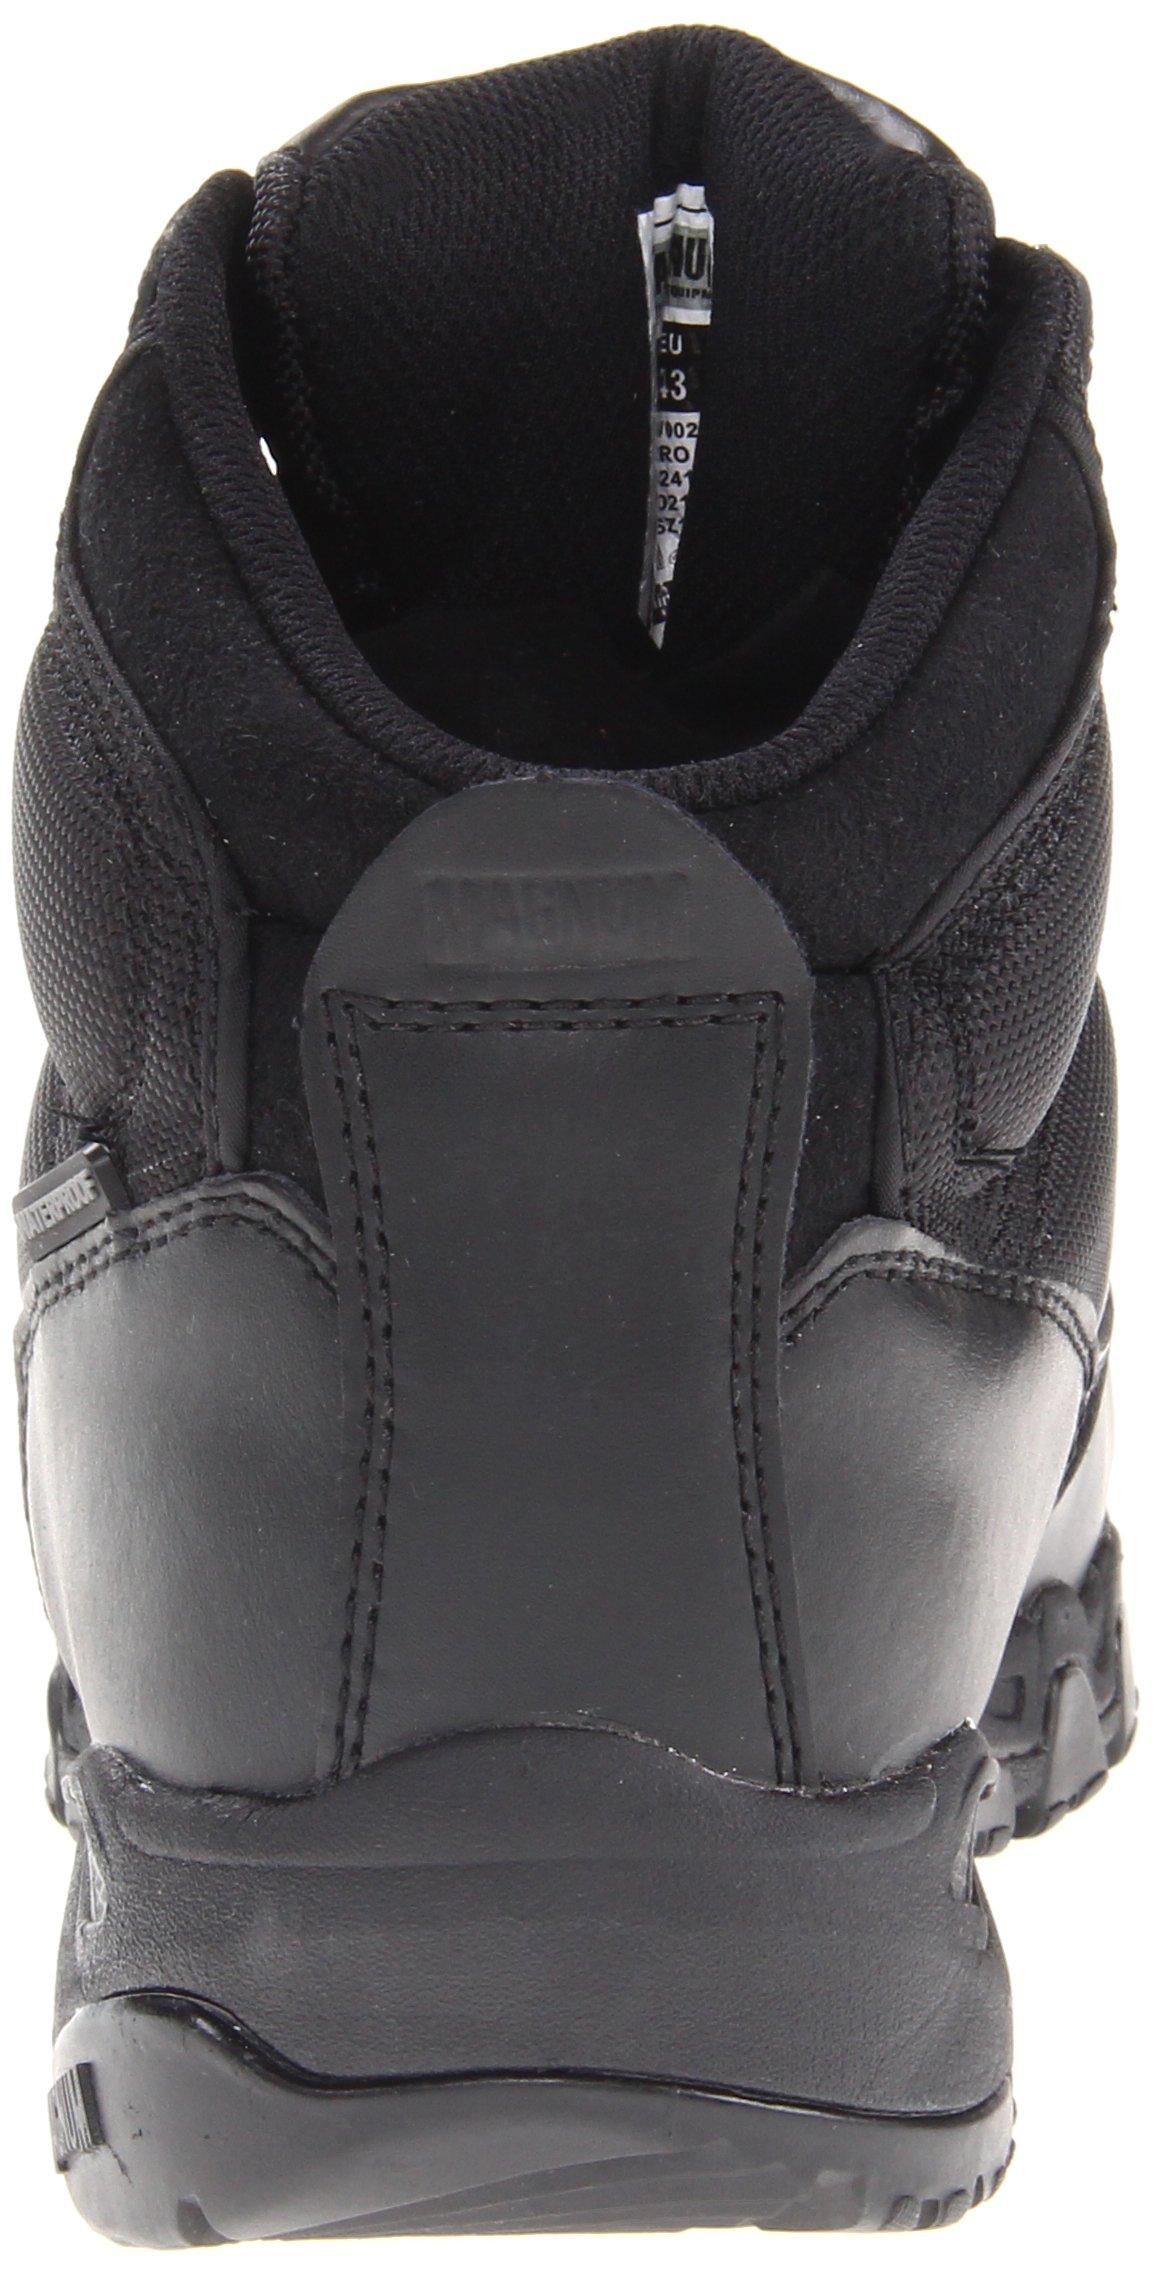 Magnum Men's Viper Pro 5 Waterproof Tactical Boot,Black,13 M US by Magnum (Image #2)